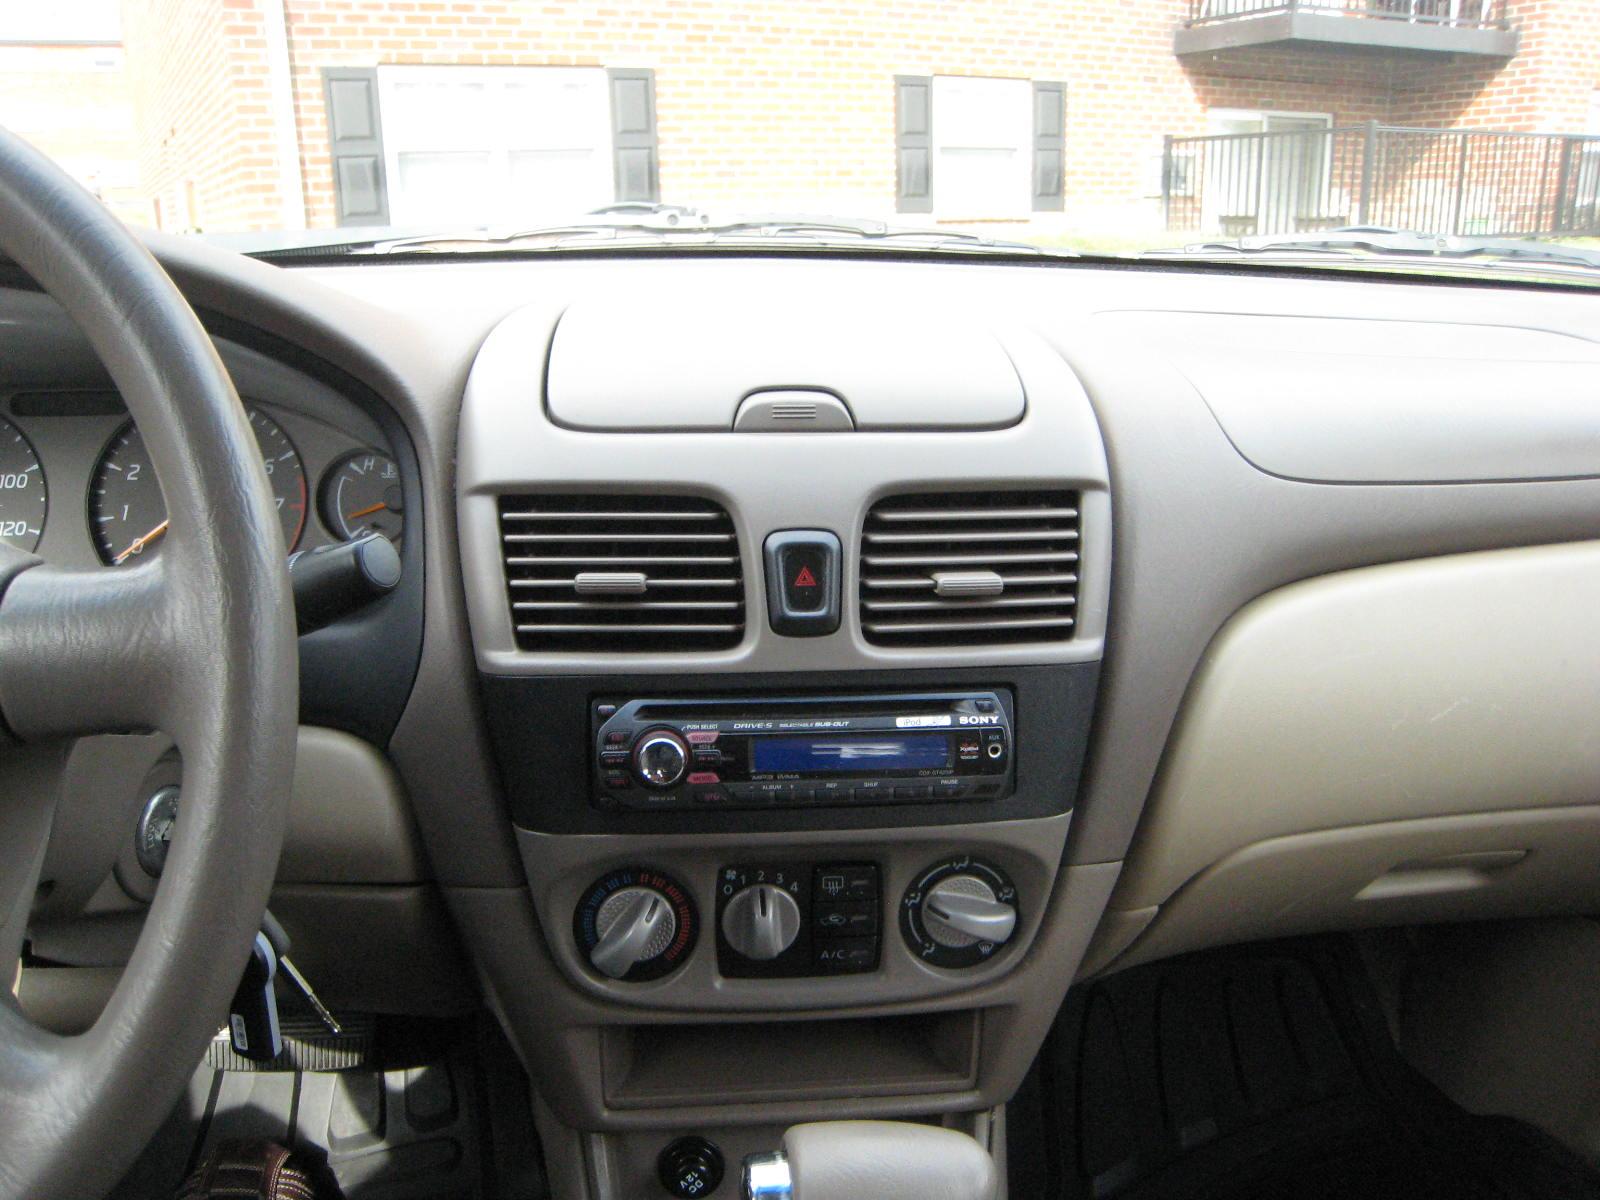 sentra nissan 2003 gxe interior cargurus cars